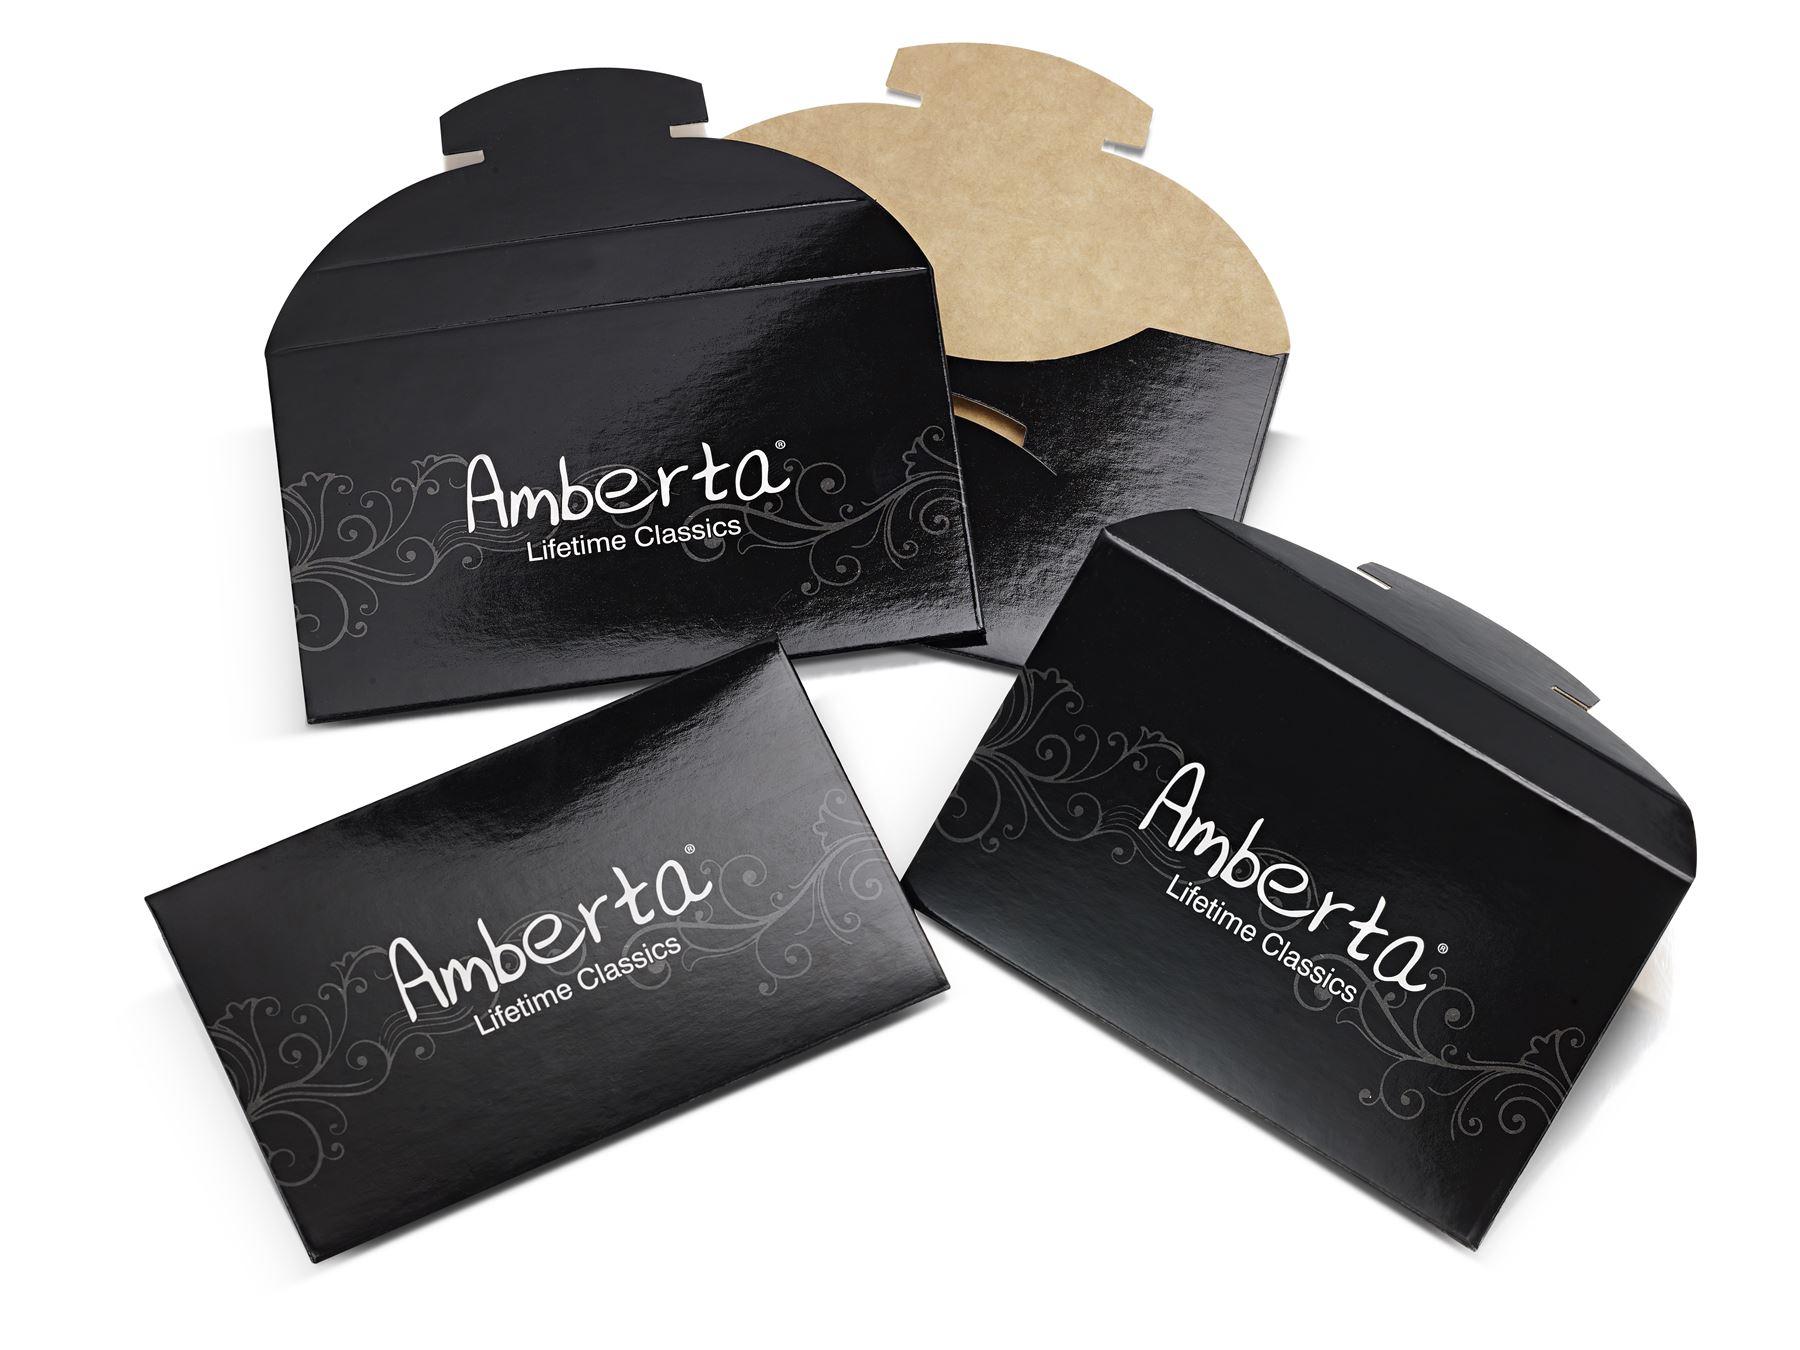 Amberta-Jewelry-925-Sterling-Silver-Adjustable-Bracelet-Italian-Bangle-for-Women miniature 73